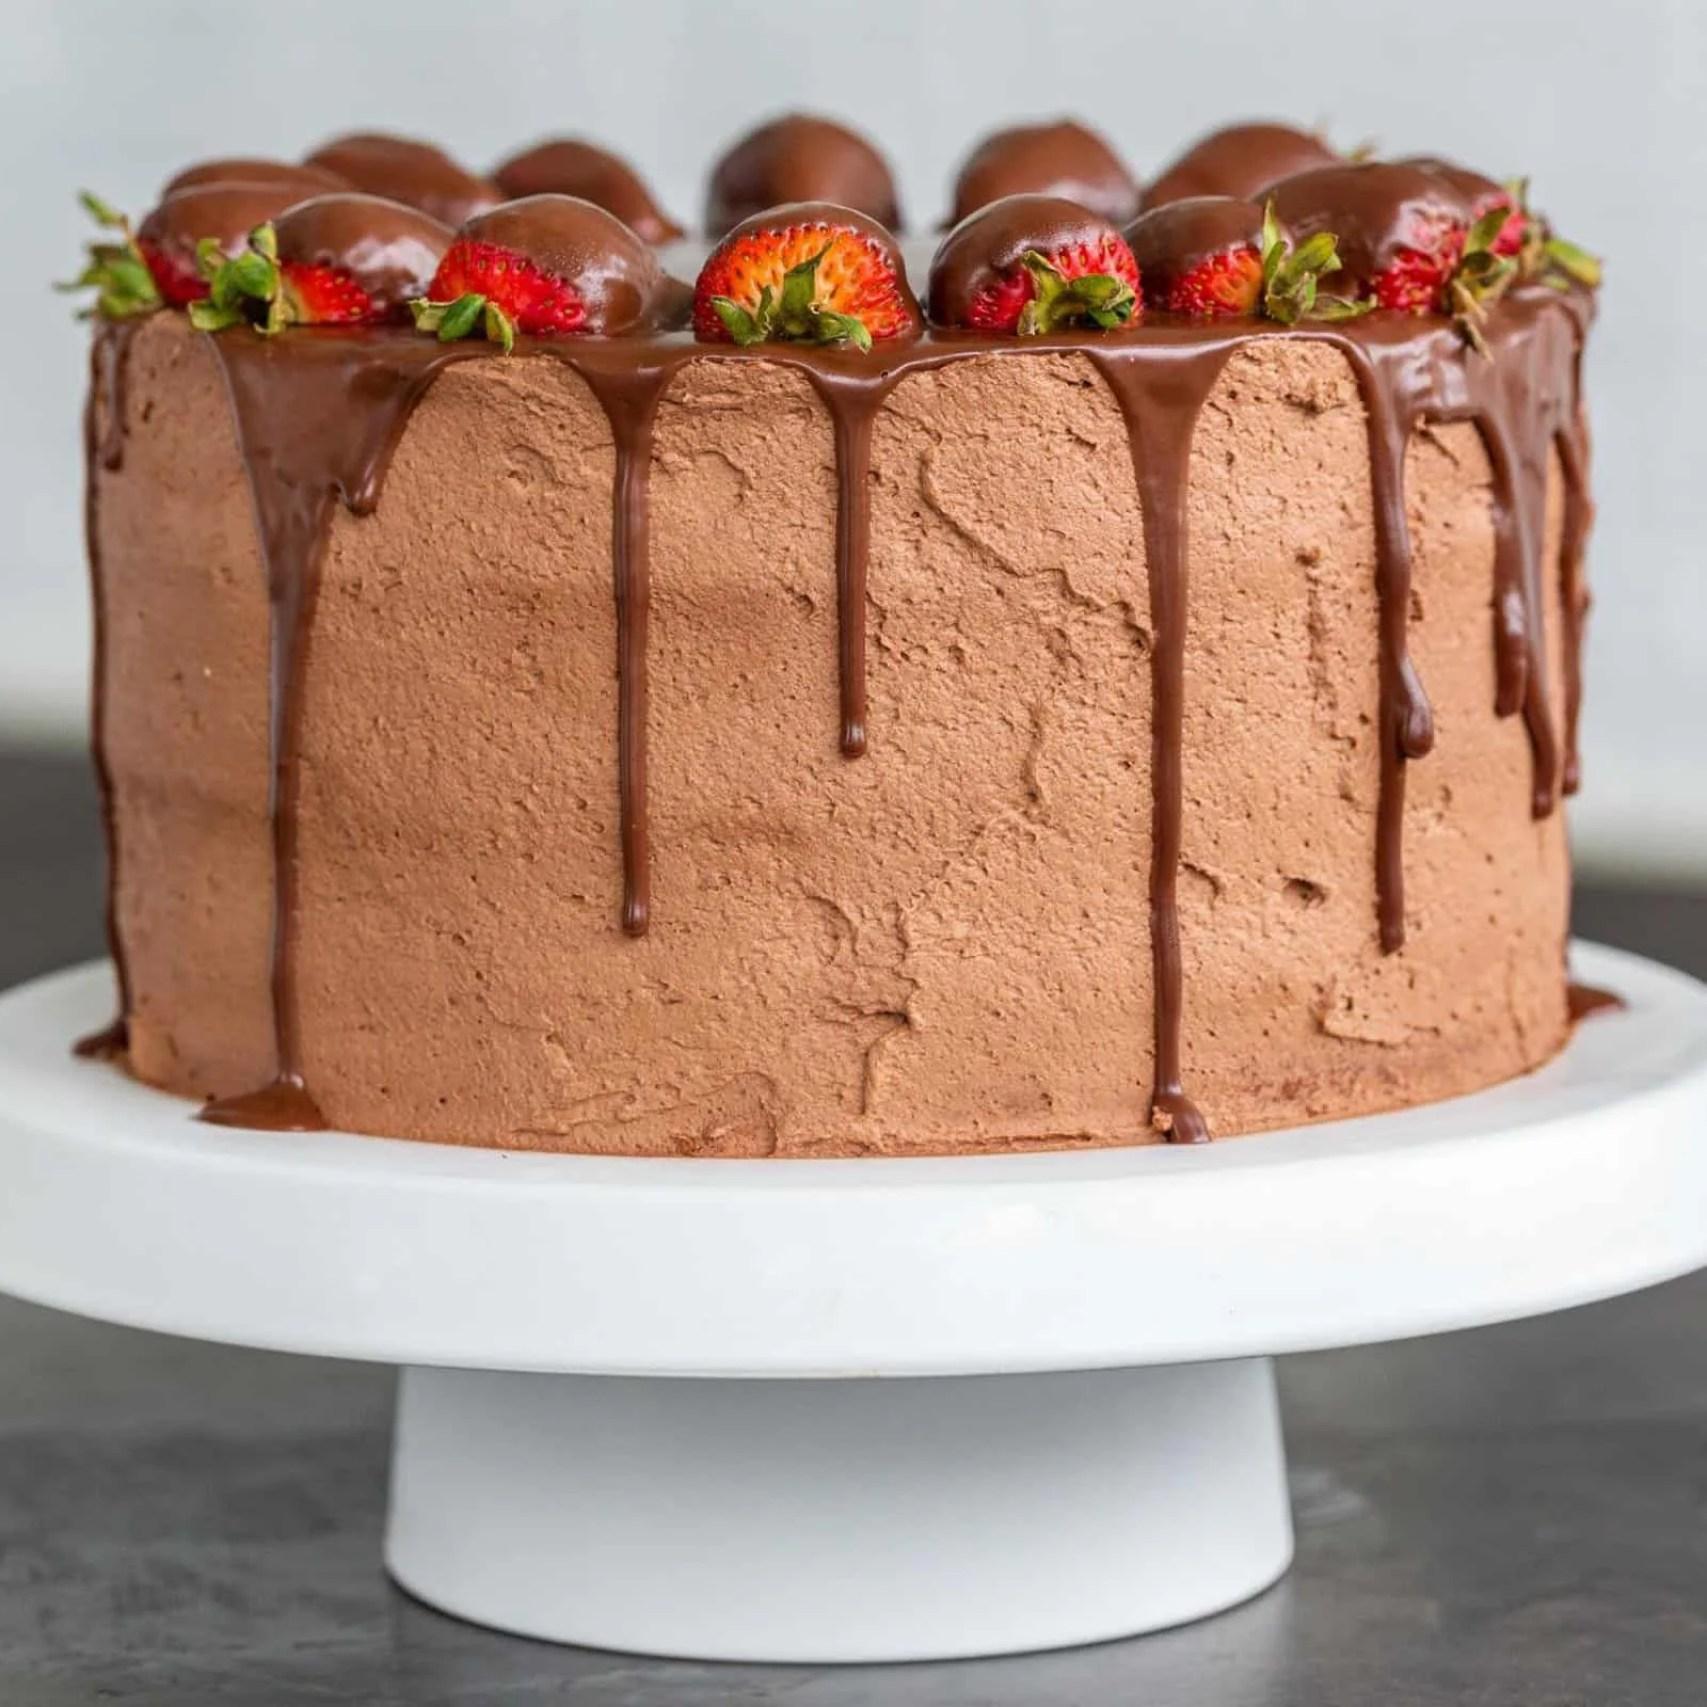 Strawberry chocolate cake on a cake stand